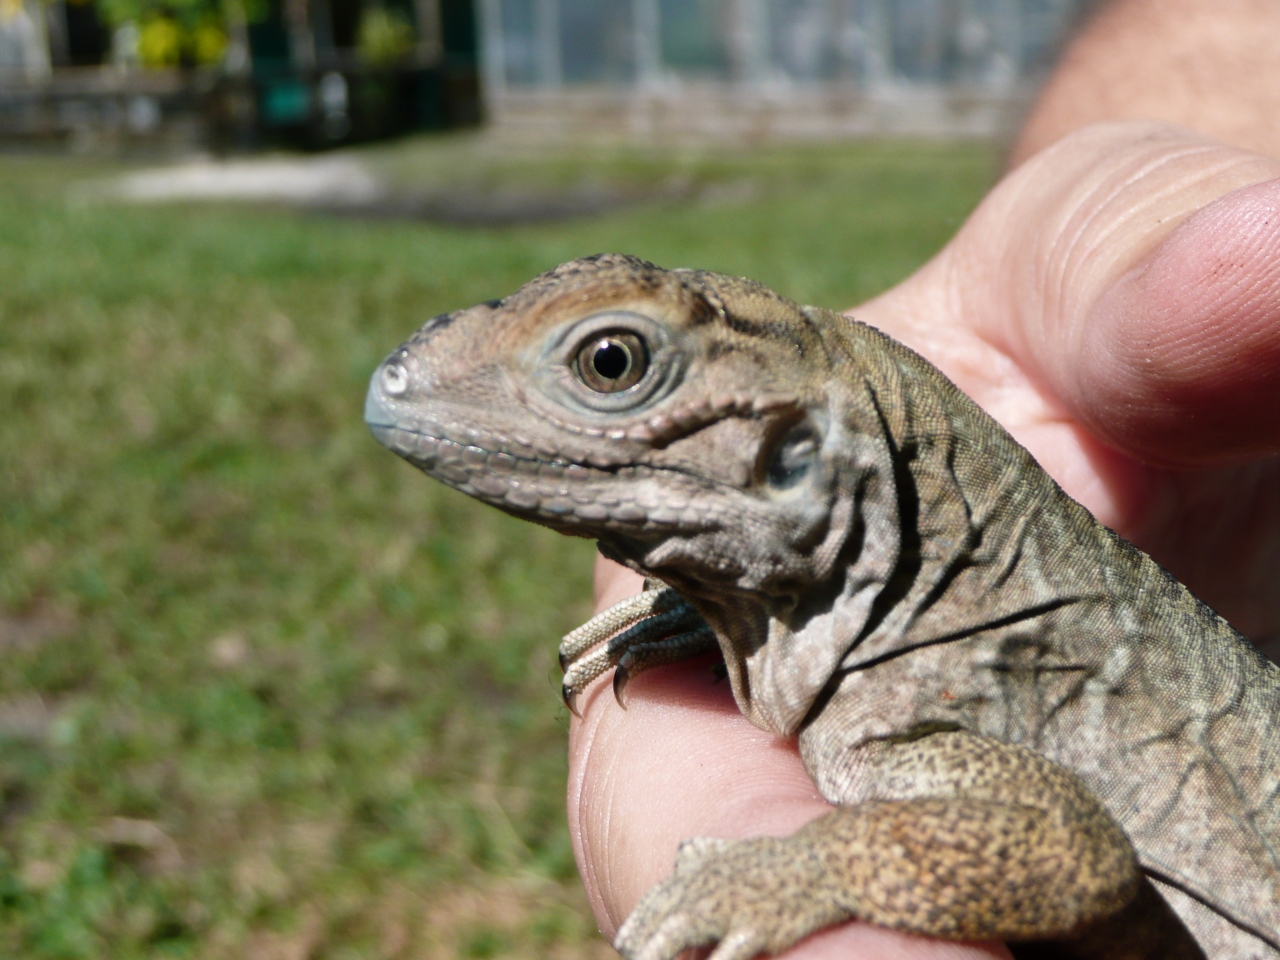 Hatchling-Rhinoceros-Iguanas-2015-Florida.jpg